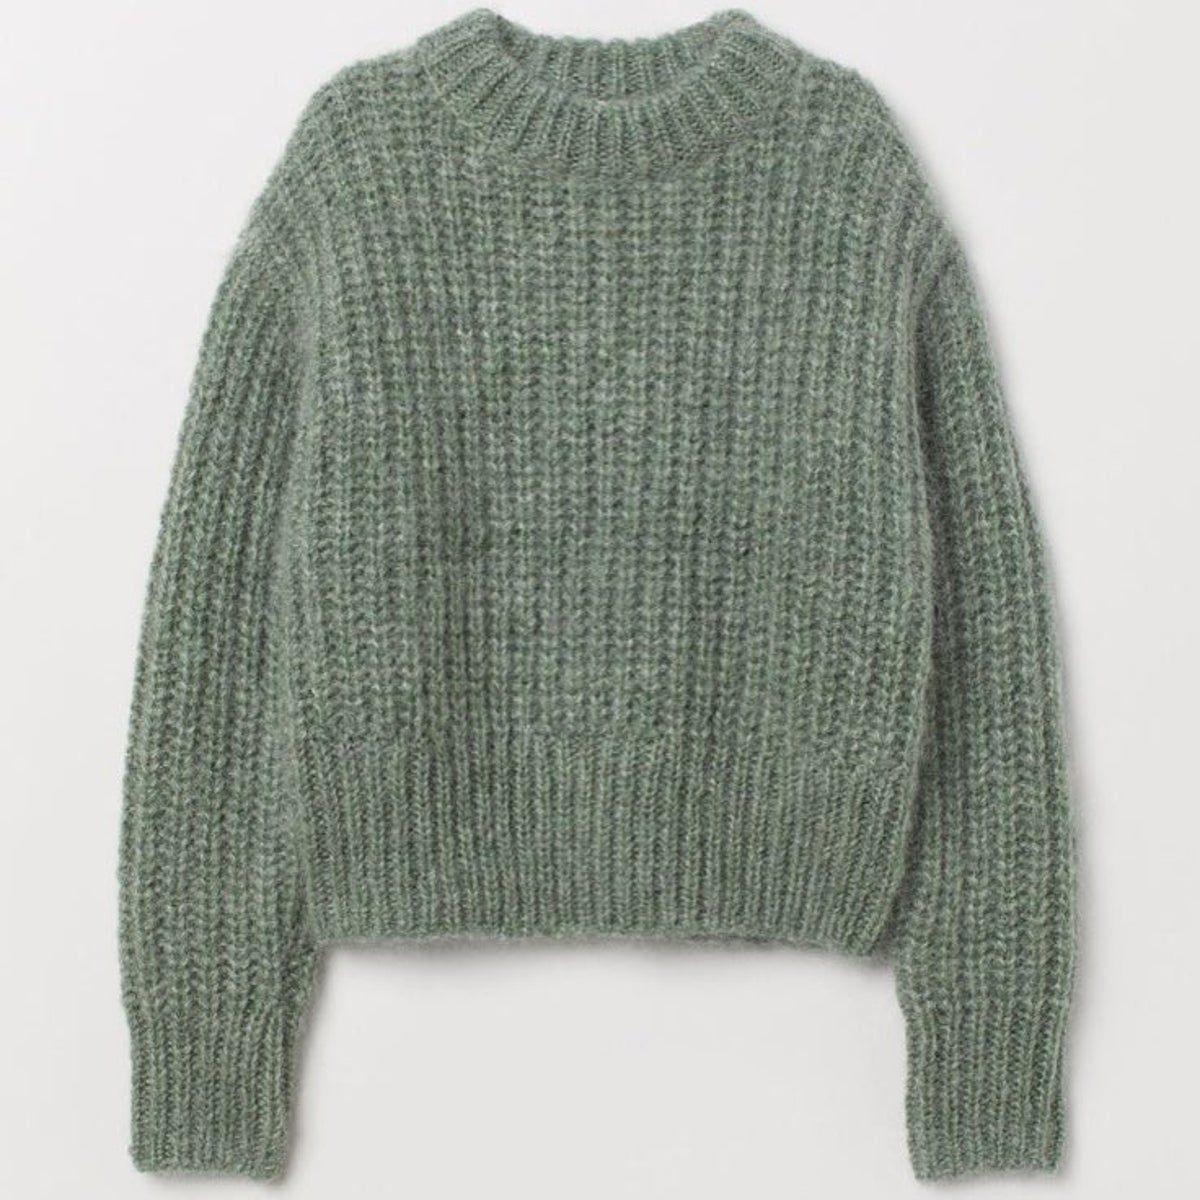 H&M Green Mohair Sweater. on Mercari